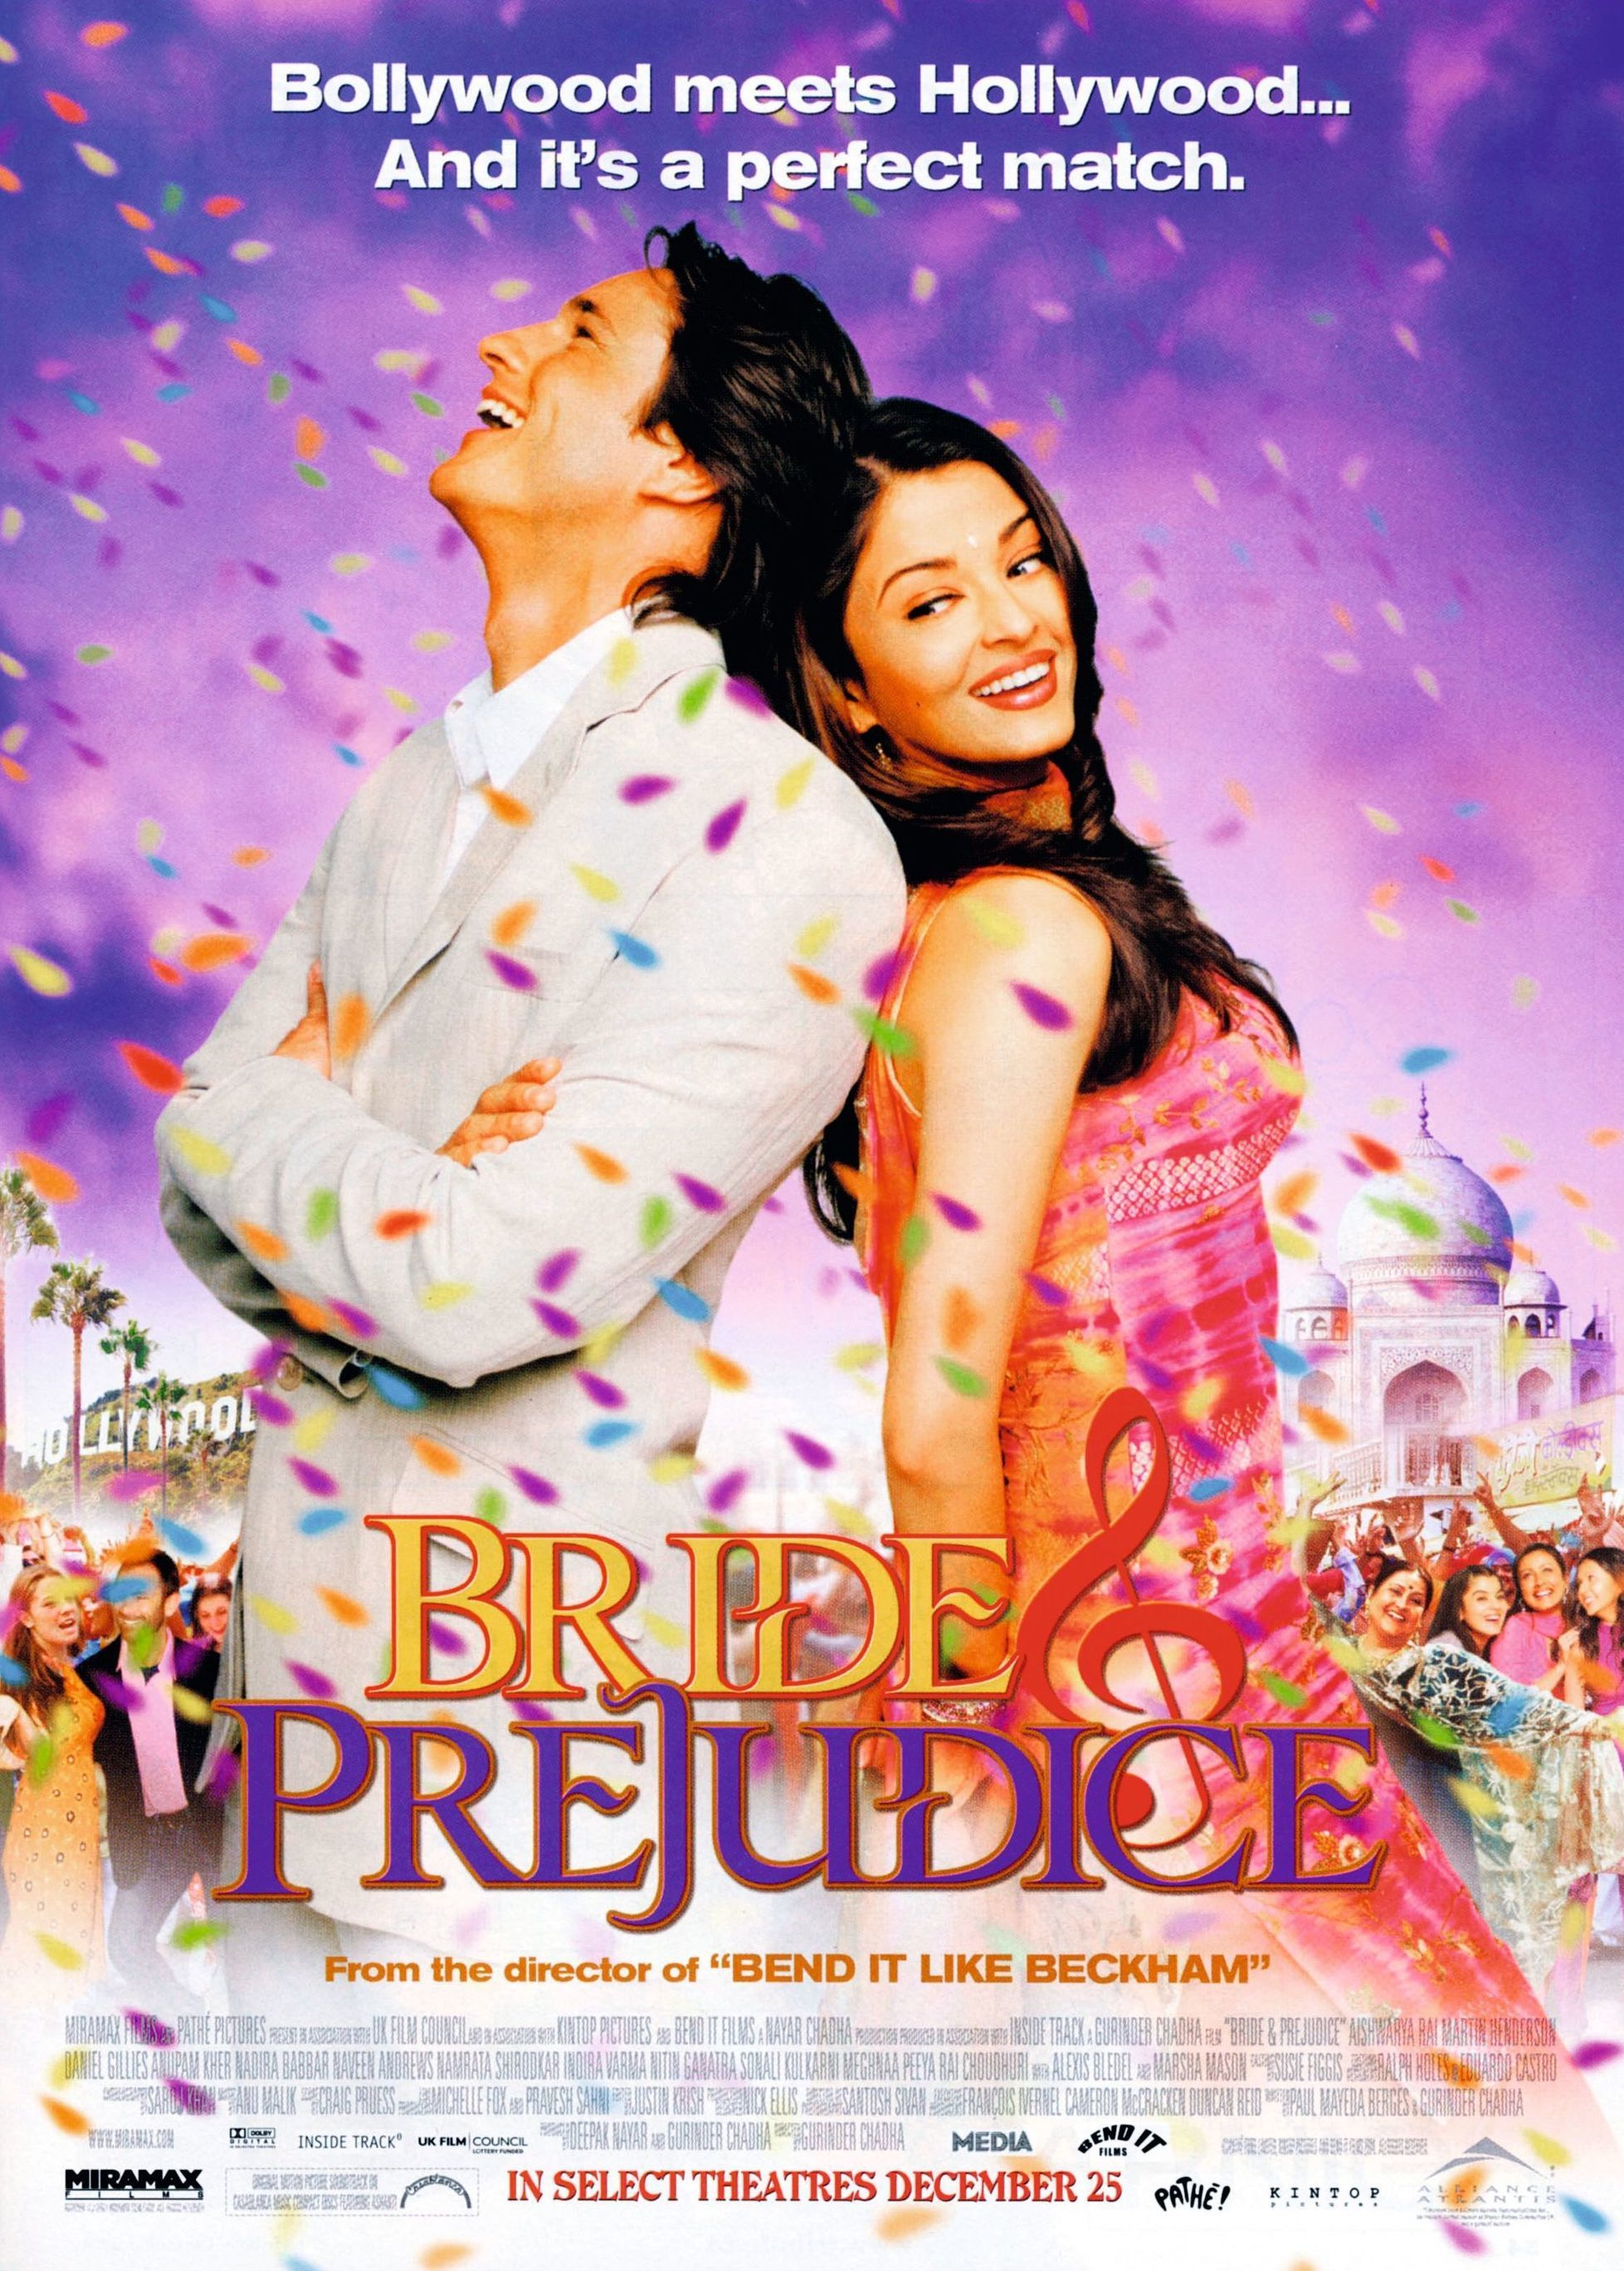 Bride & Prejudice, by Gurinder Chadha, 2004.